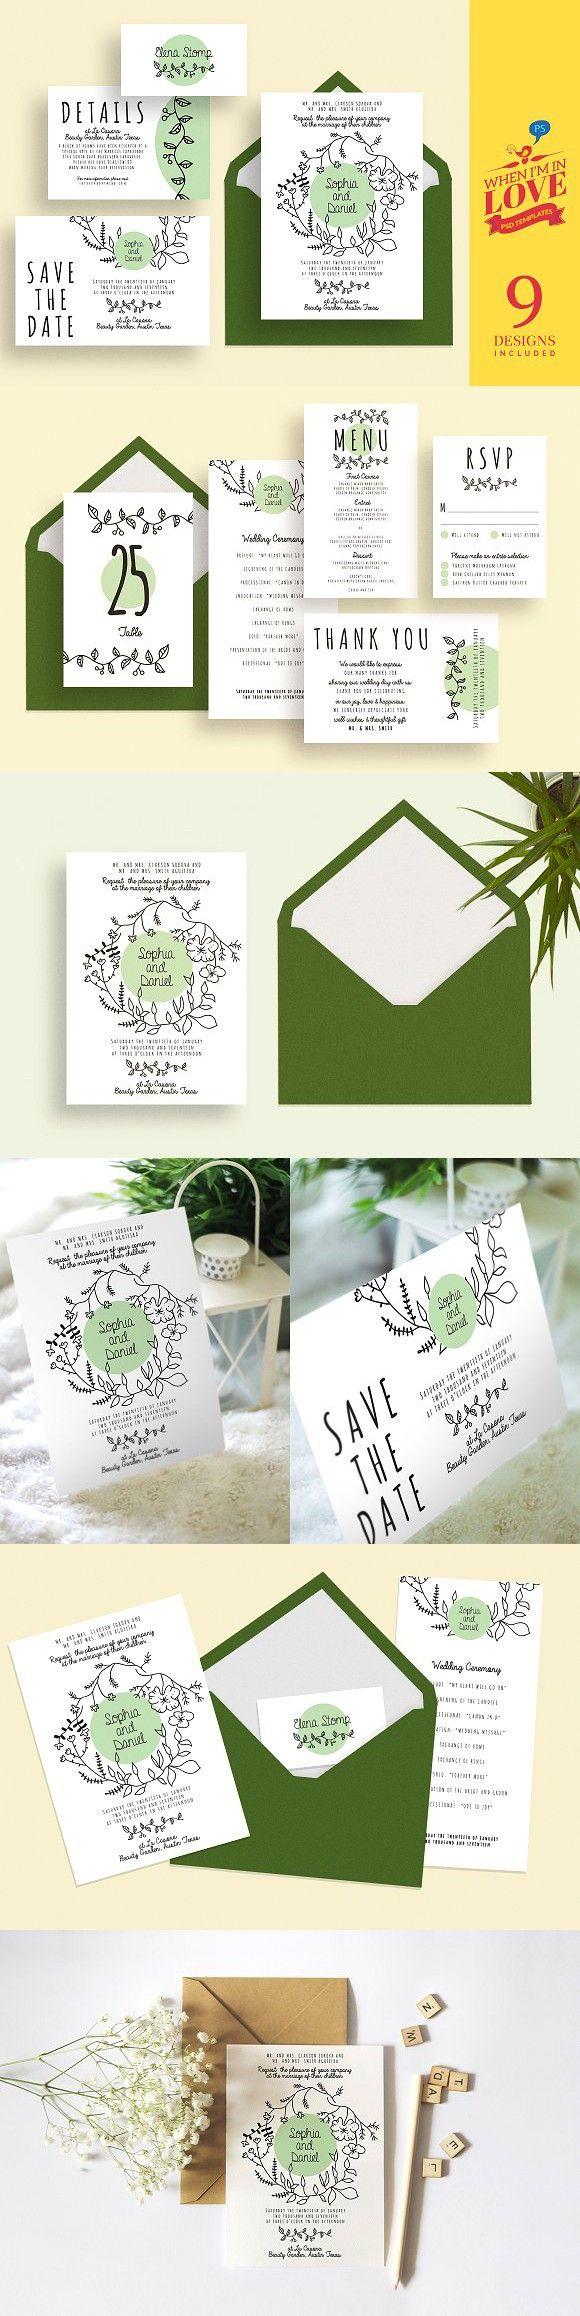 Allison - Wedding Set 4. Wedding Card Templates